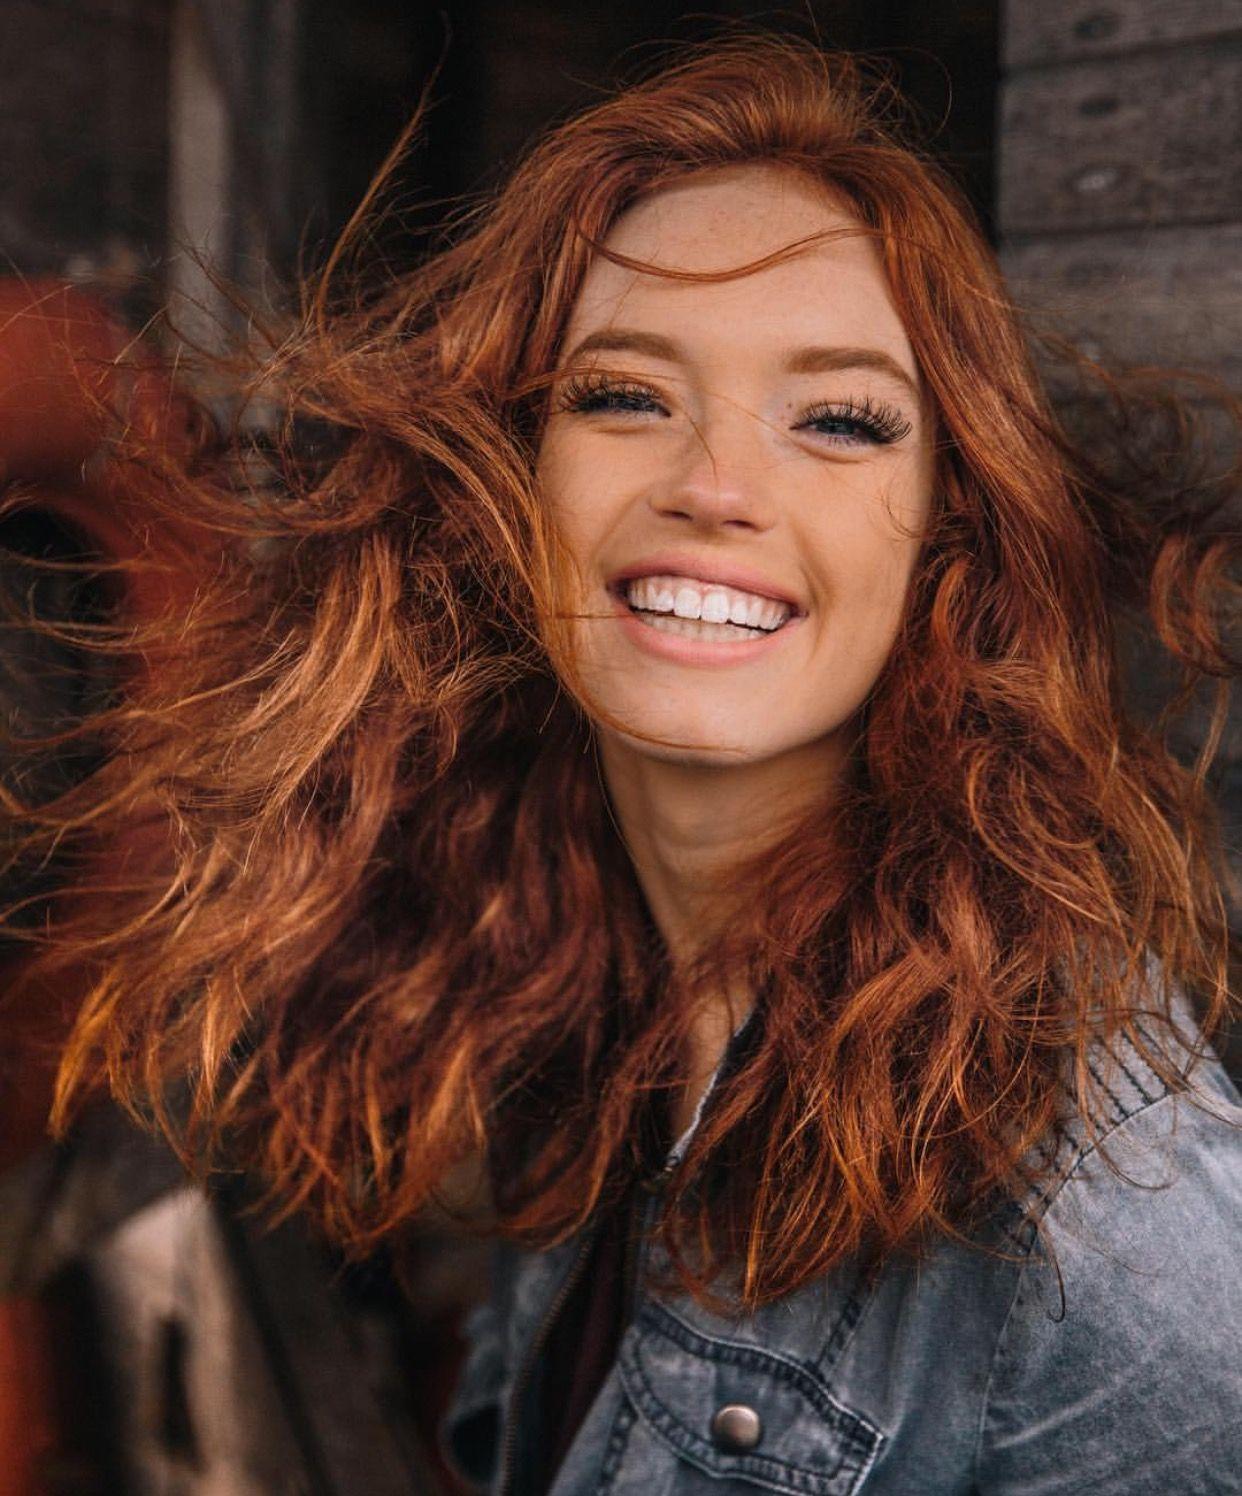 Riley rasmussen red headz in pinterest hair redheads and